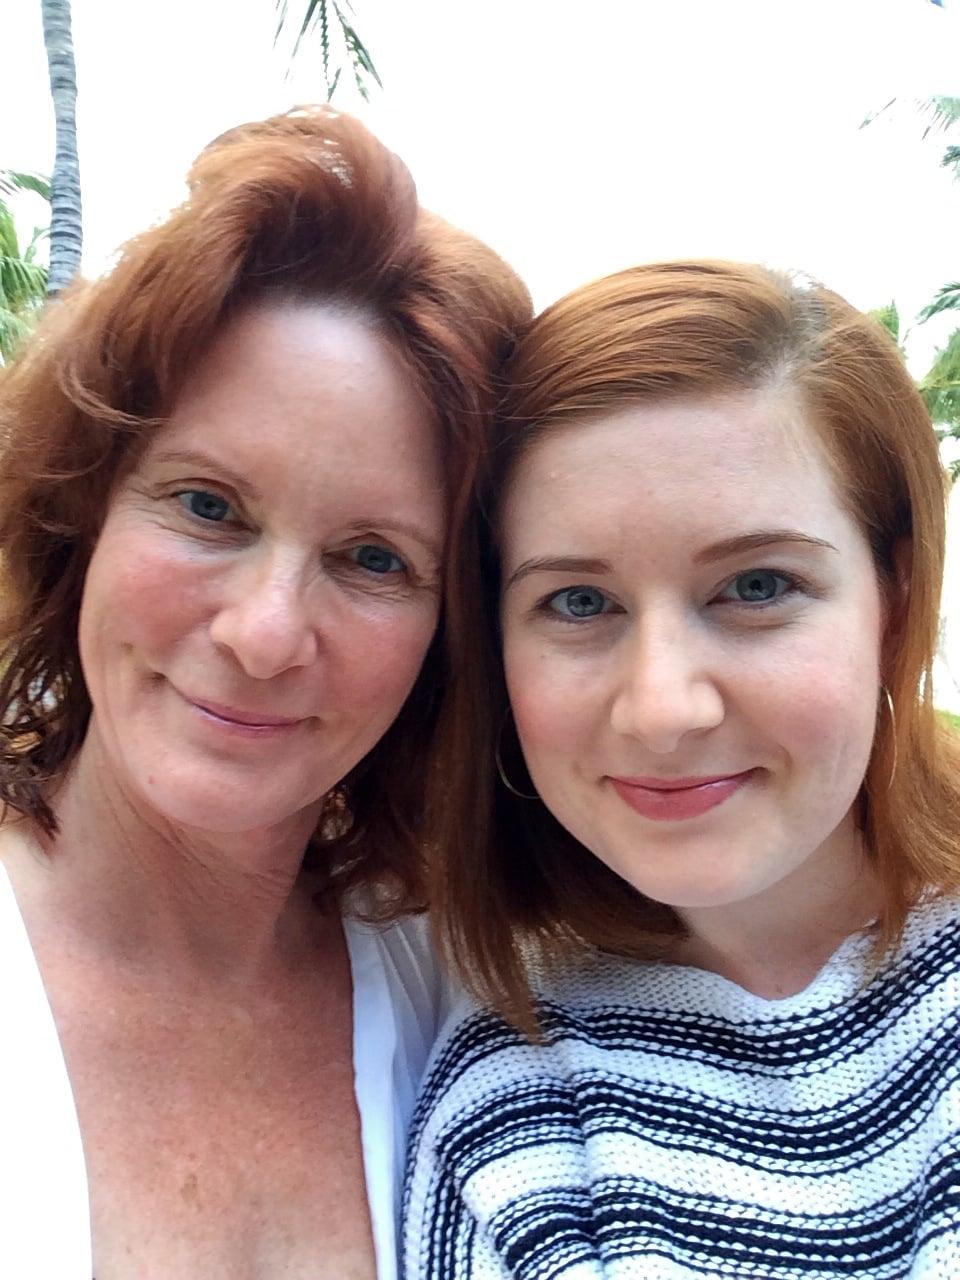 Heather and Maggie Pehanick